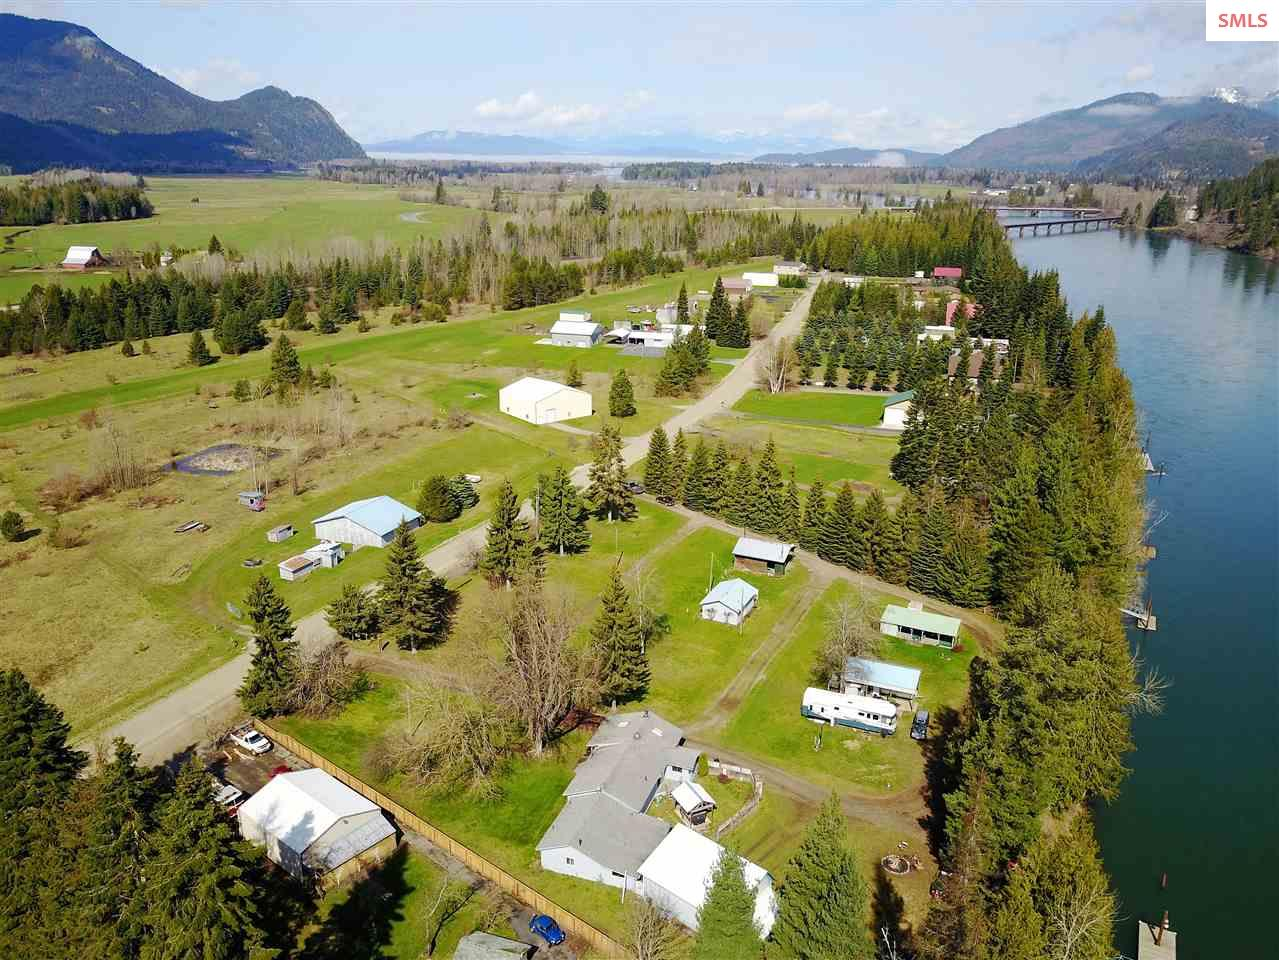 Single Family Home for Sale at 145 N River Lake Drive 145 N River Lake Drive Clark Fork, Idaho 83811 United States